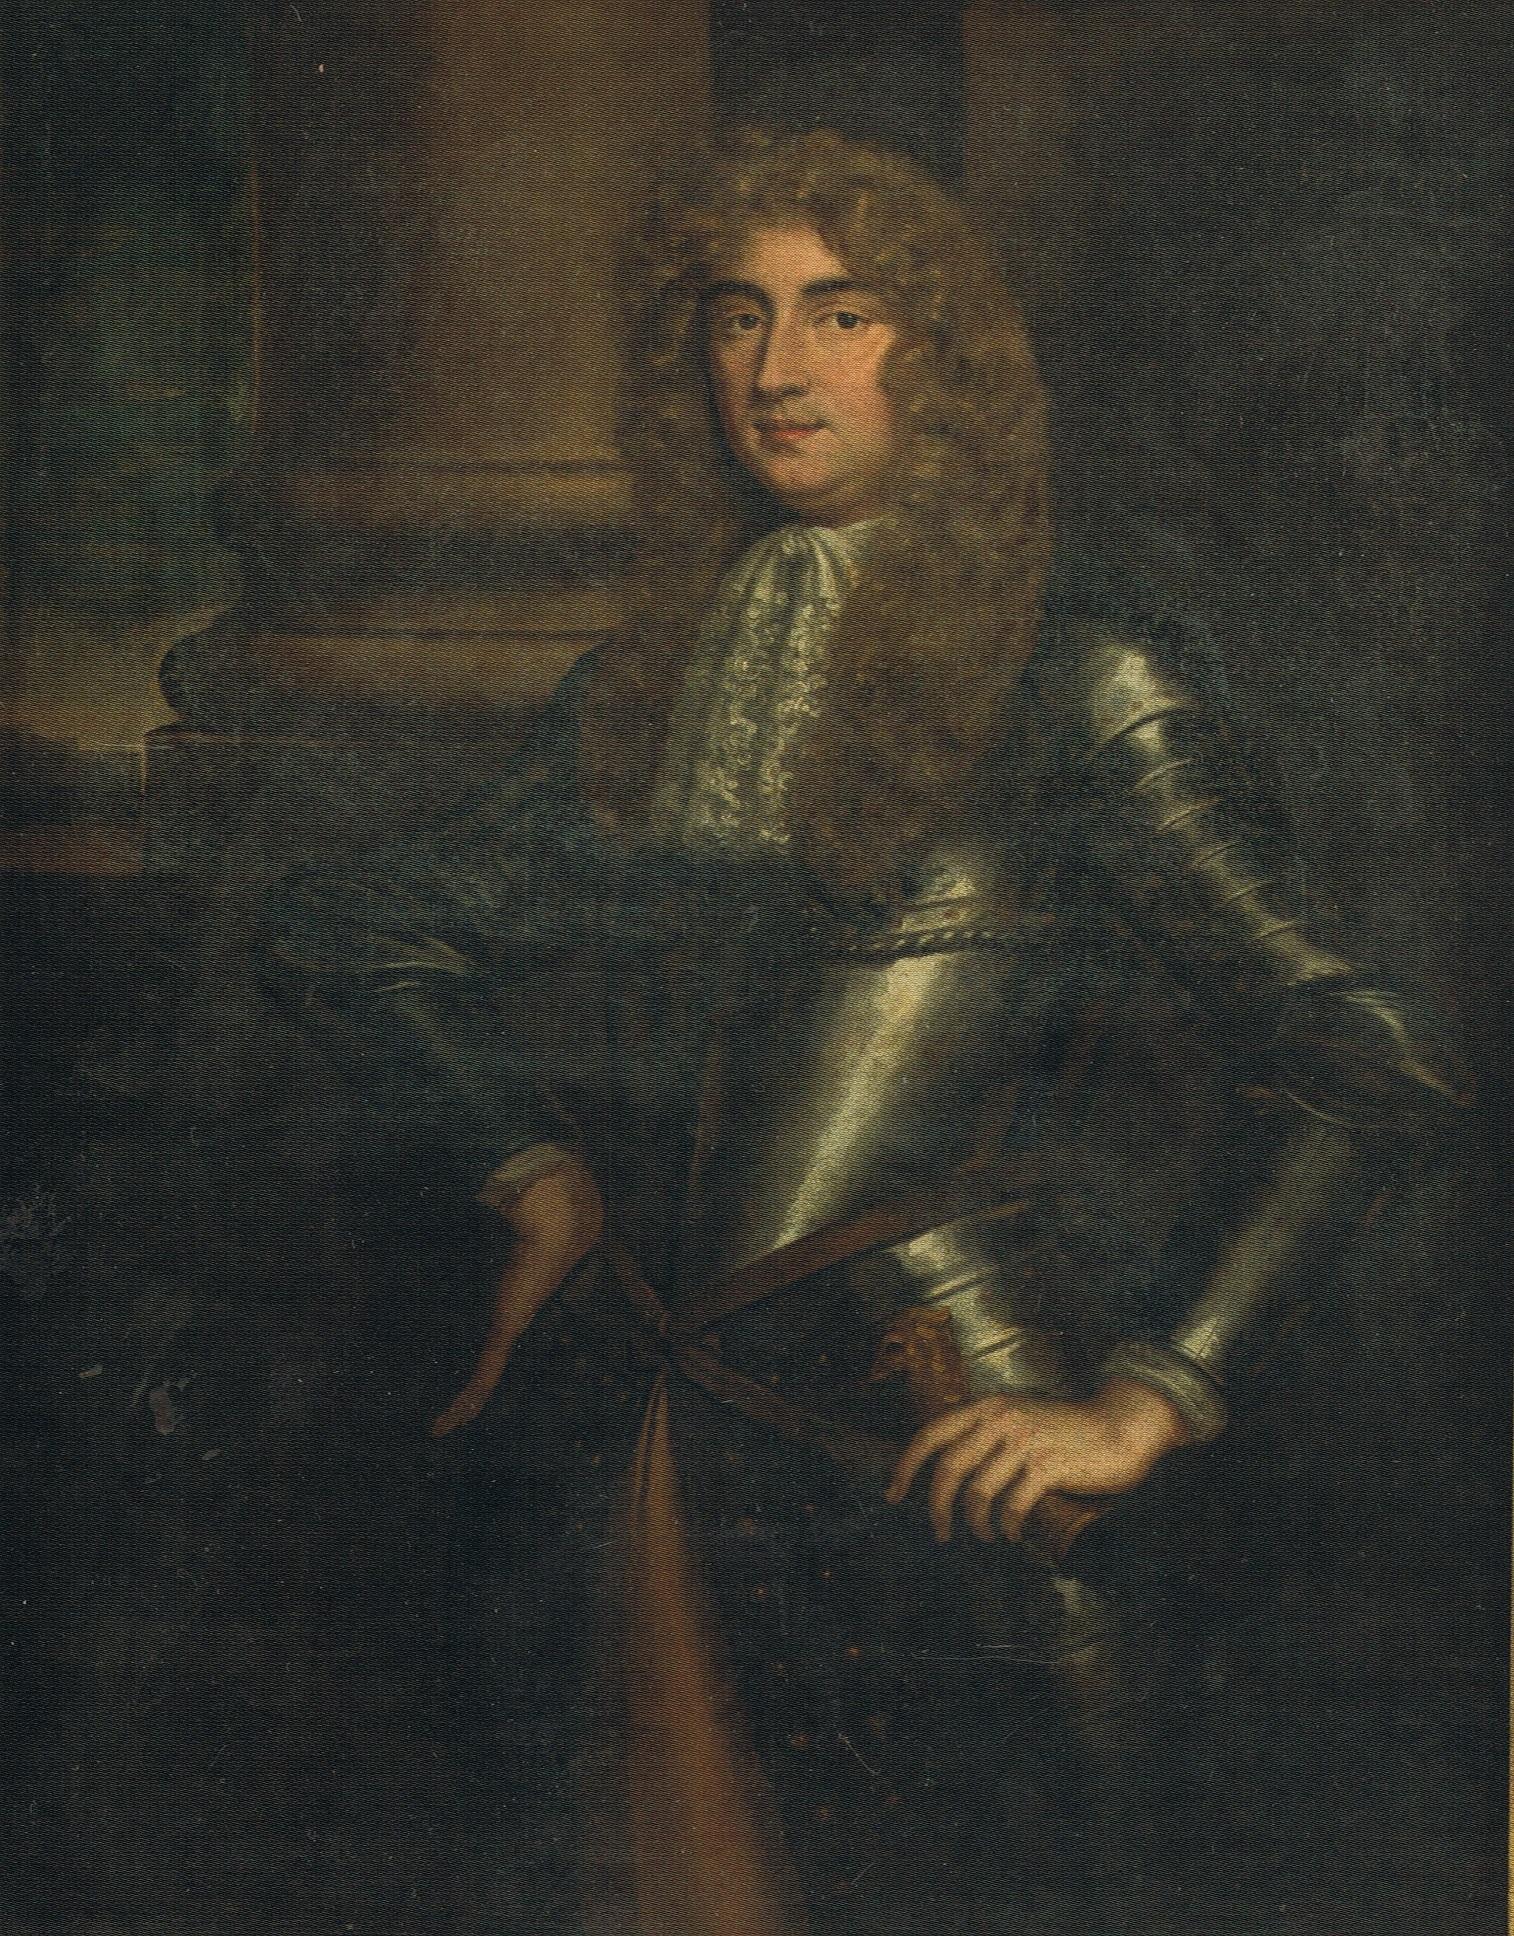 Charles Dormer (1632-1697), 2nd Earl of Carnarvon, 3rd Baron Dormer